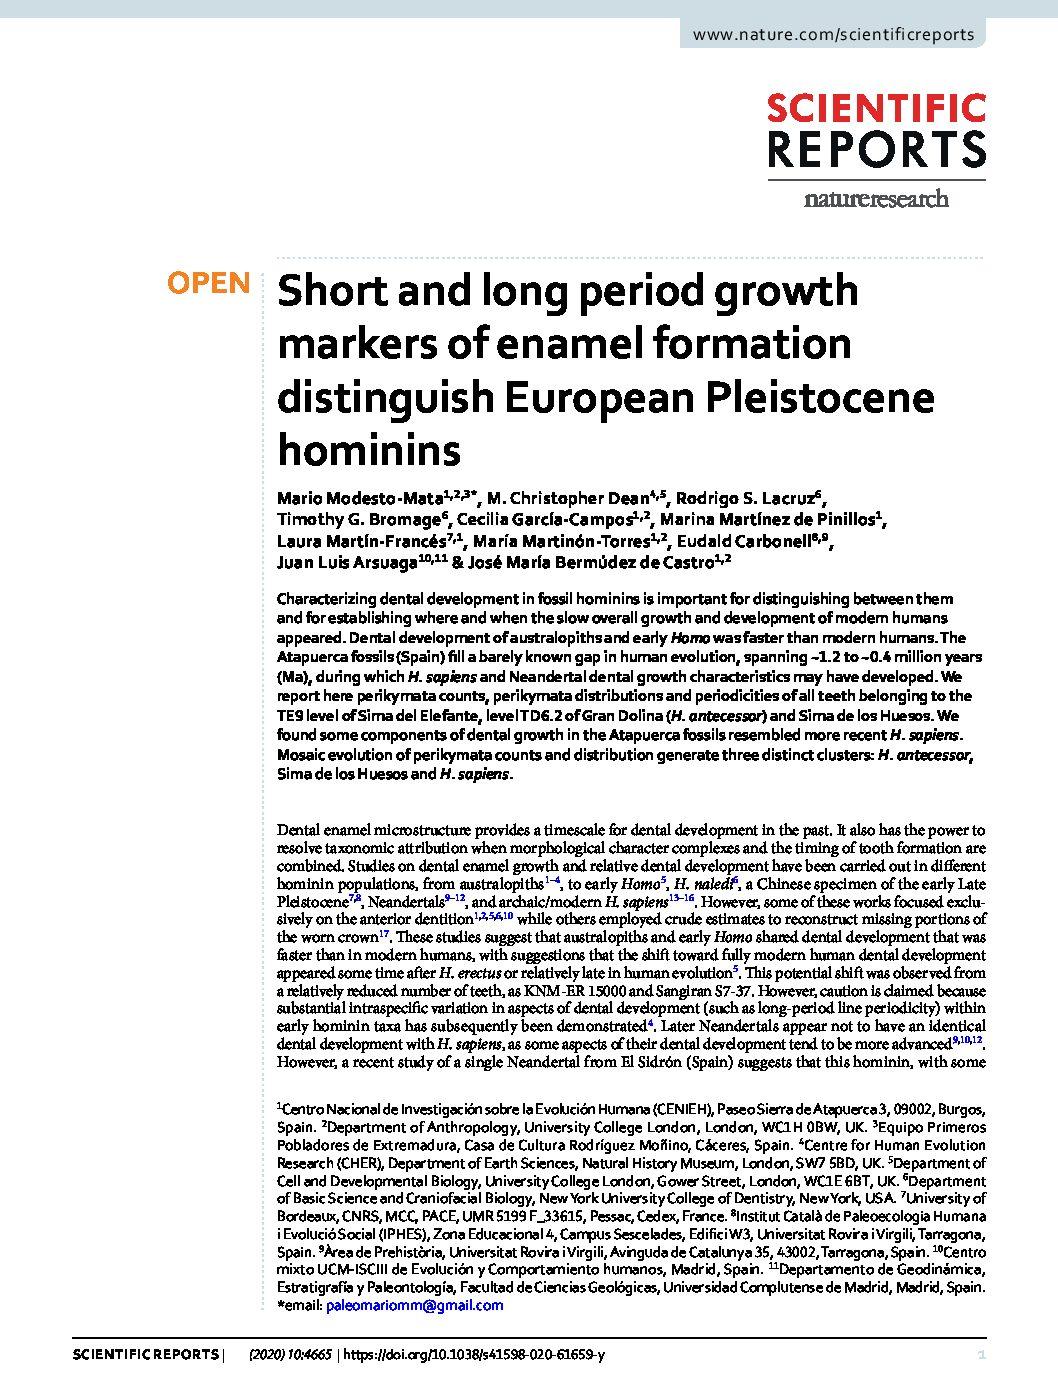 Short and long period growth markers of enamel formation distinguish European Pleistocene hominins